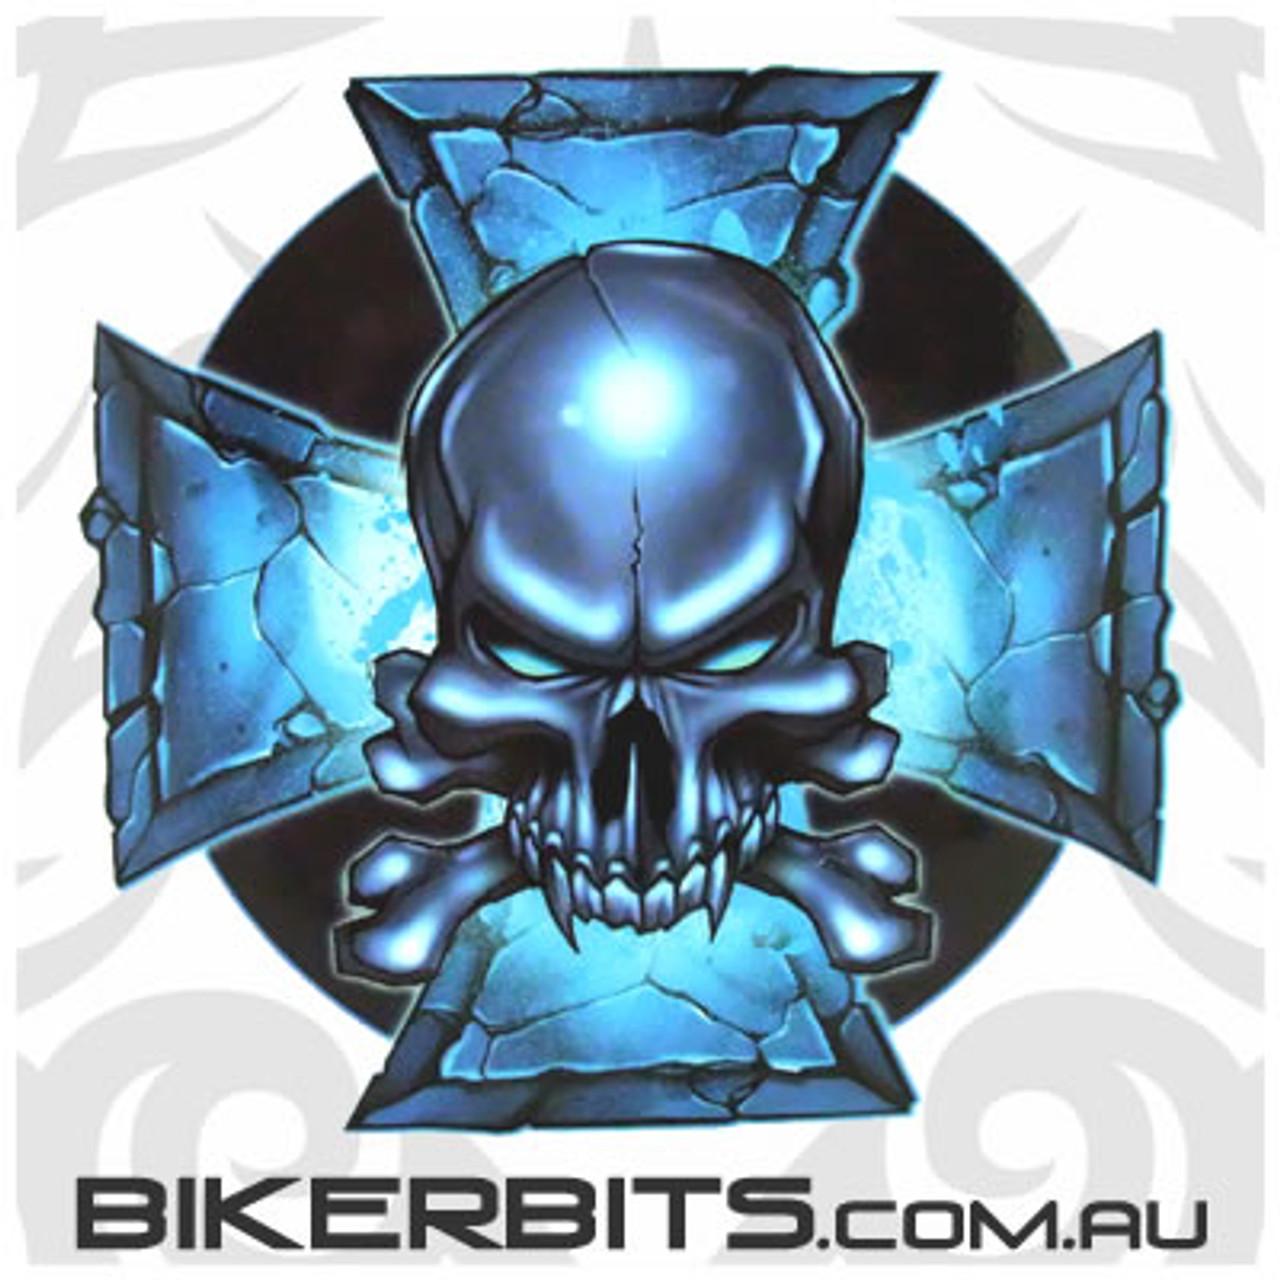 Biker Decal - Blue Stone Iron Cross & Skull